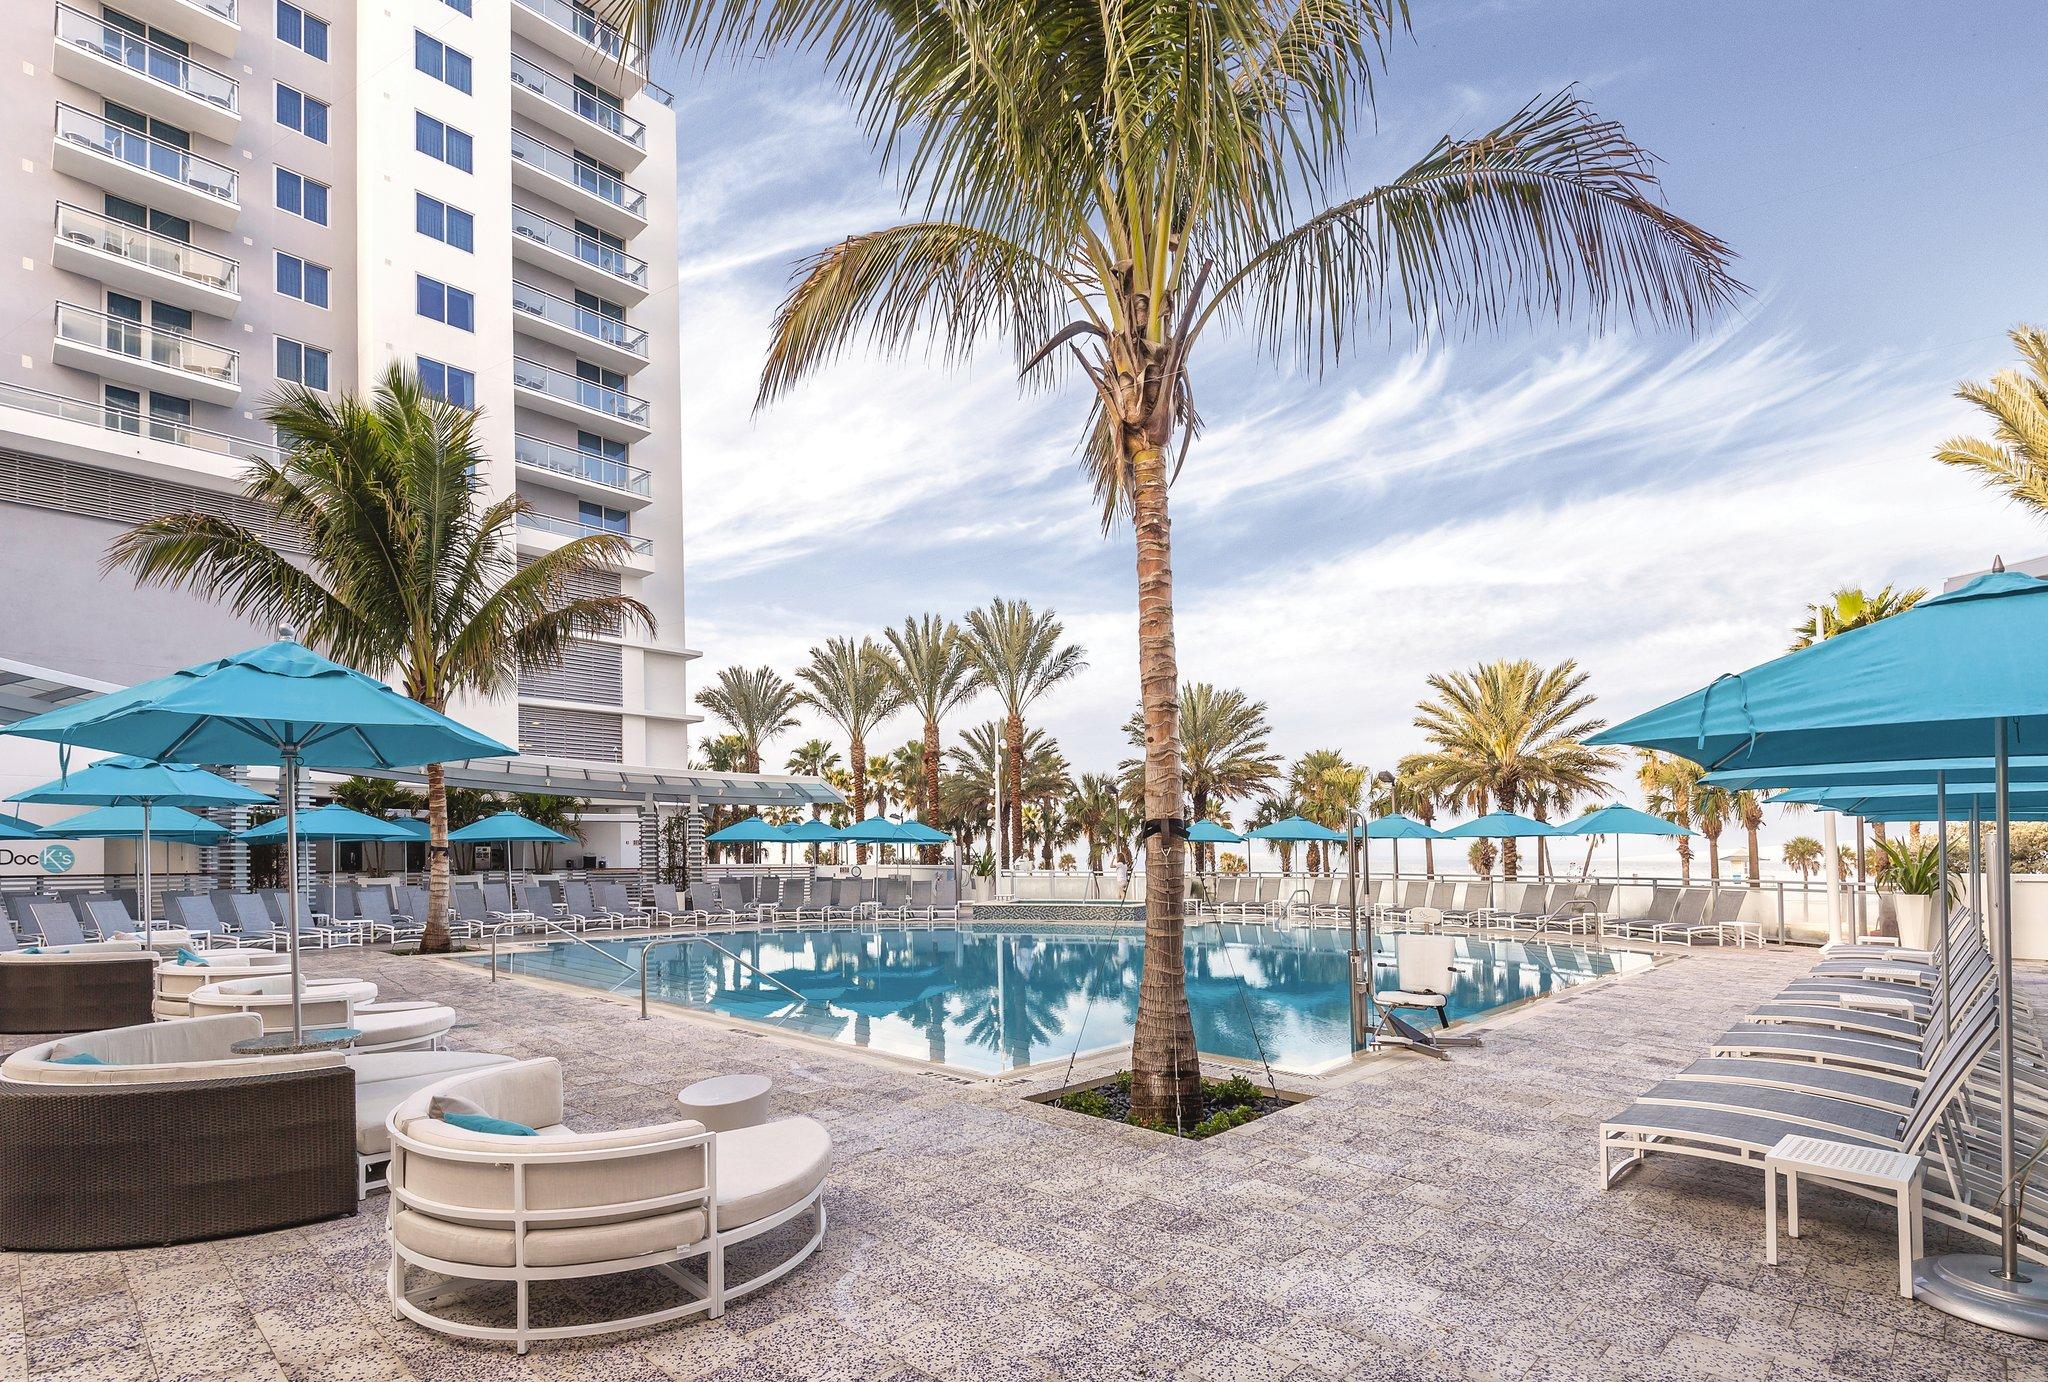 Wyndham Clearwater Beach Resort Pool View